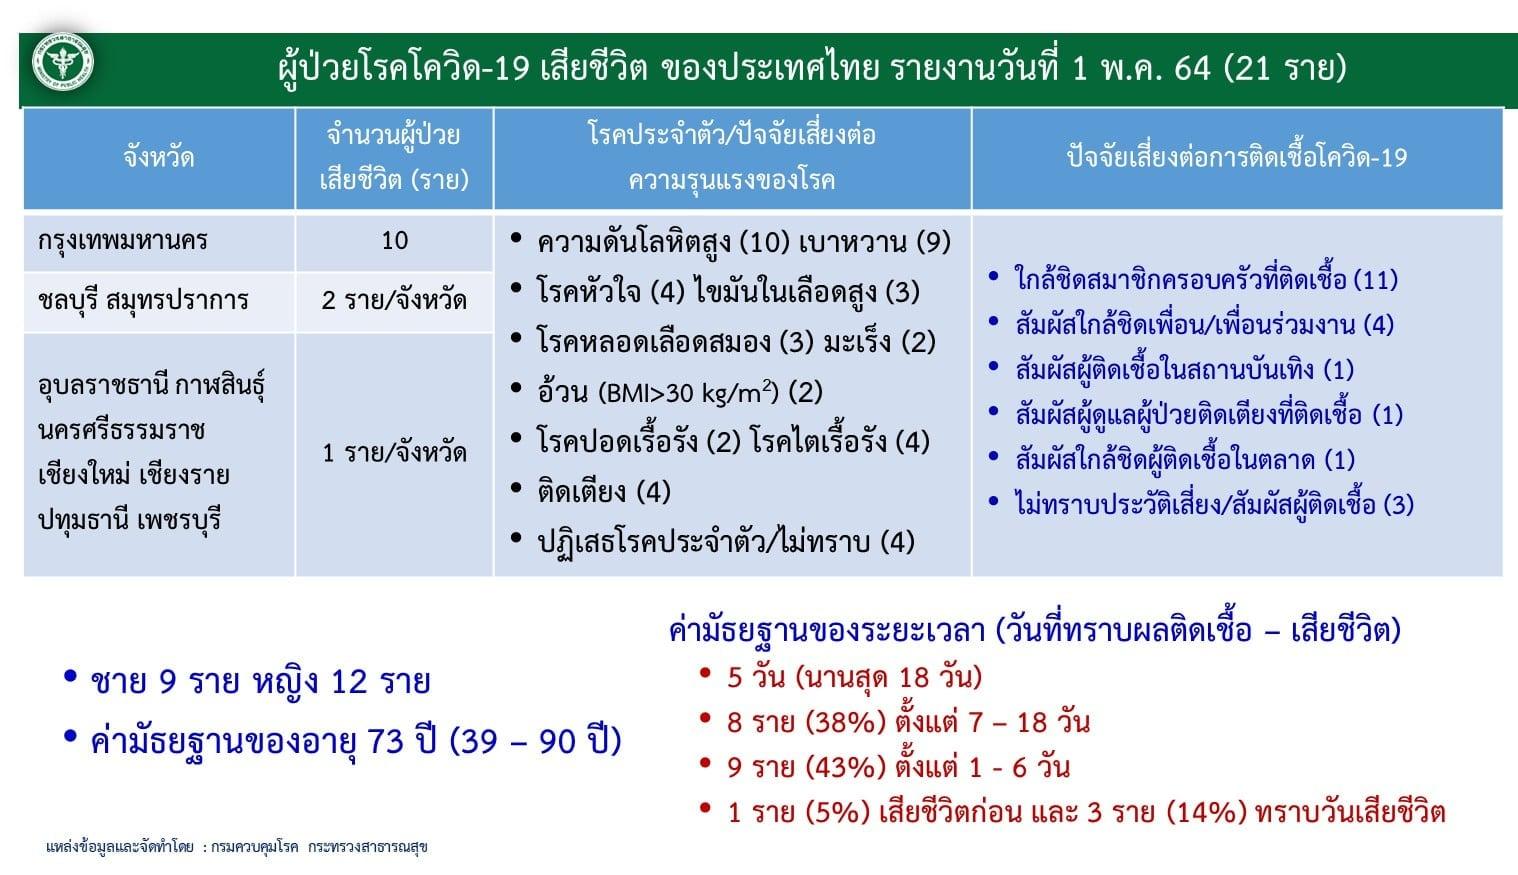 www.thaiguide.dk/images/forum/covid19/dodsfald%20detaljer%2001-05.jpg